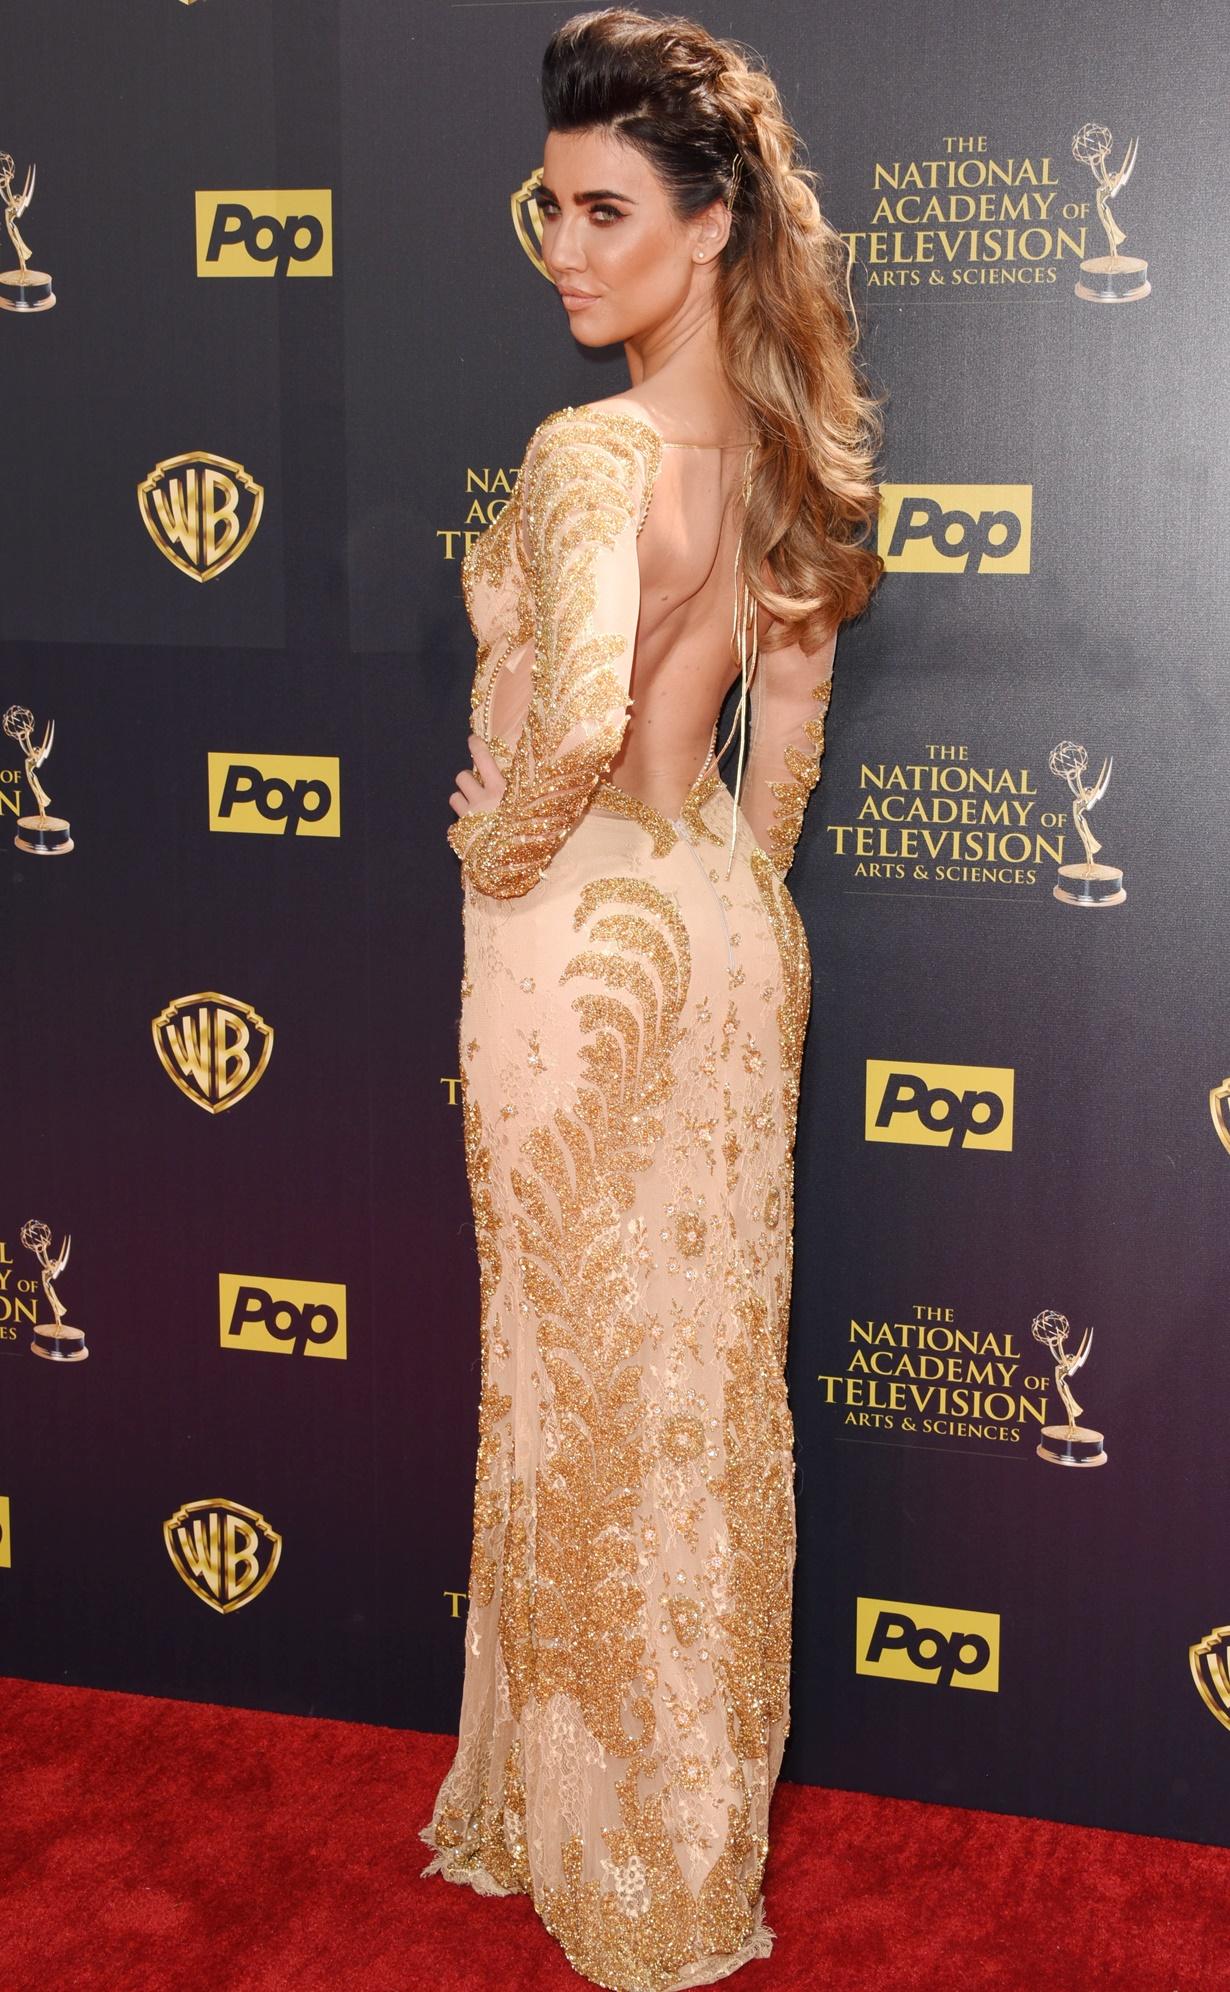 Jacqueline MacInnes Wood Daytime Emmys 2015 B&B